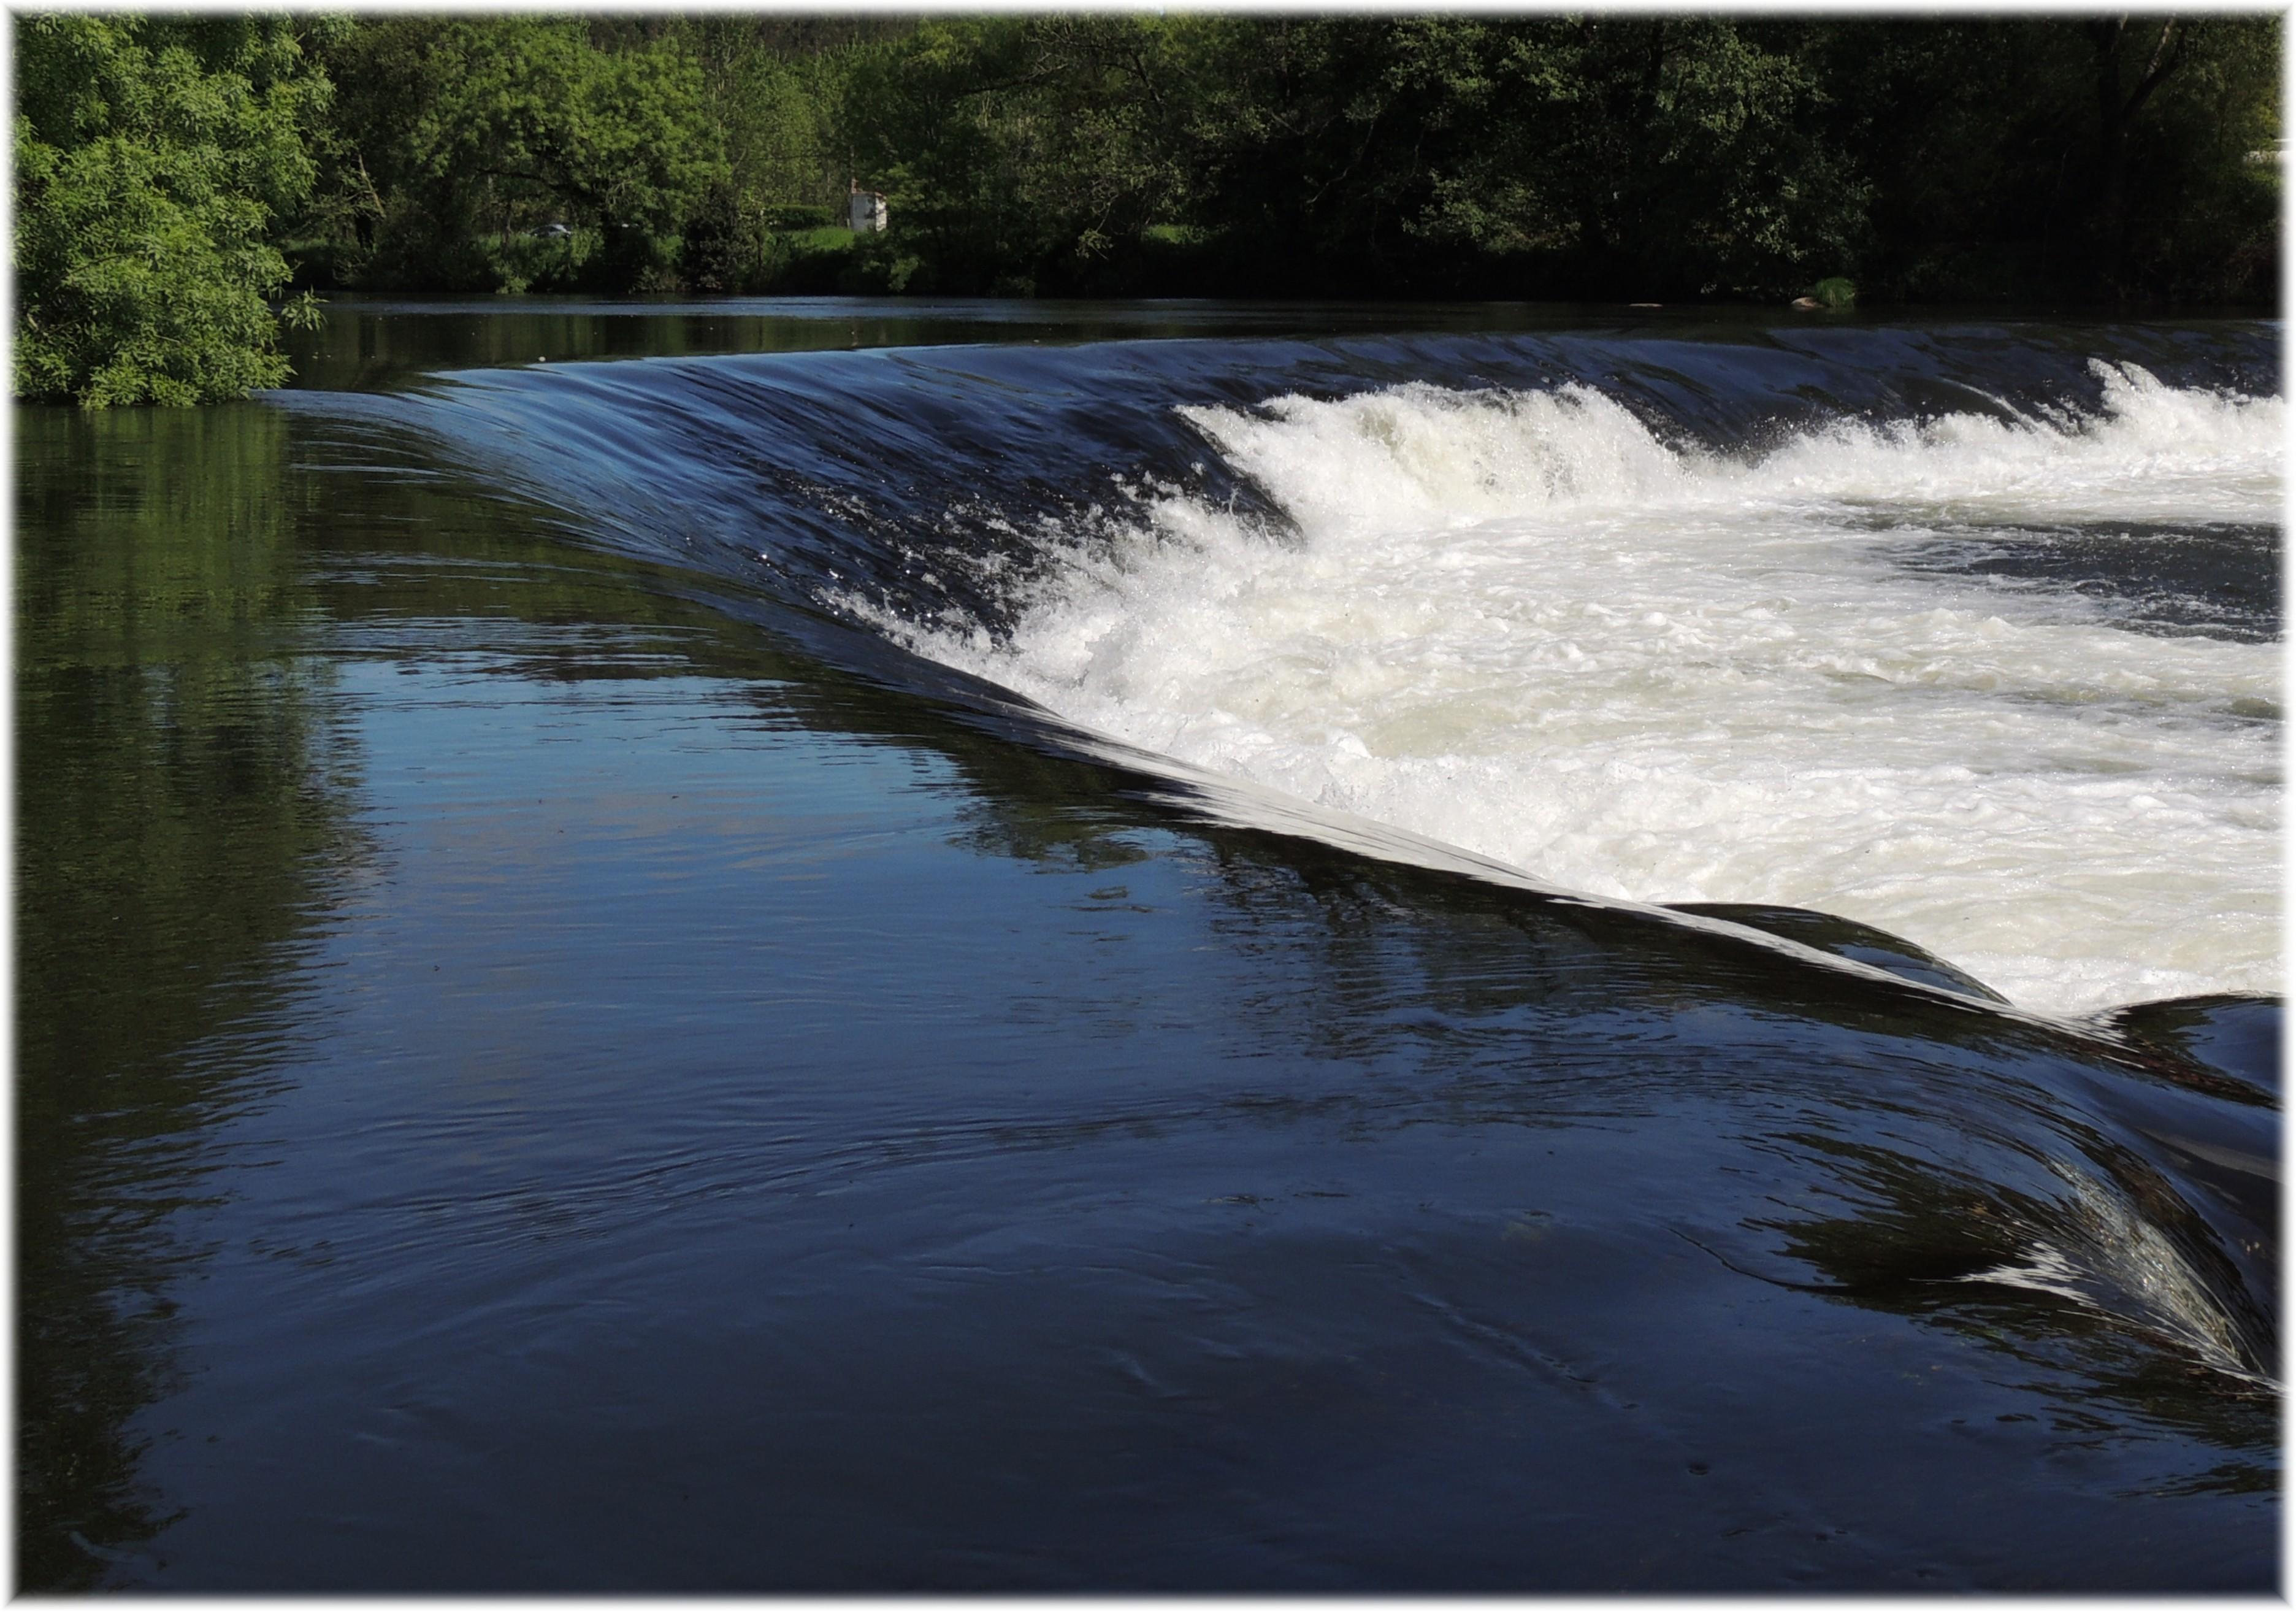 Reka Sinko